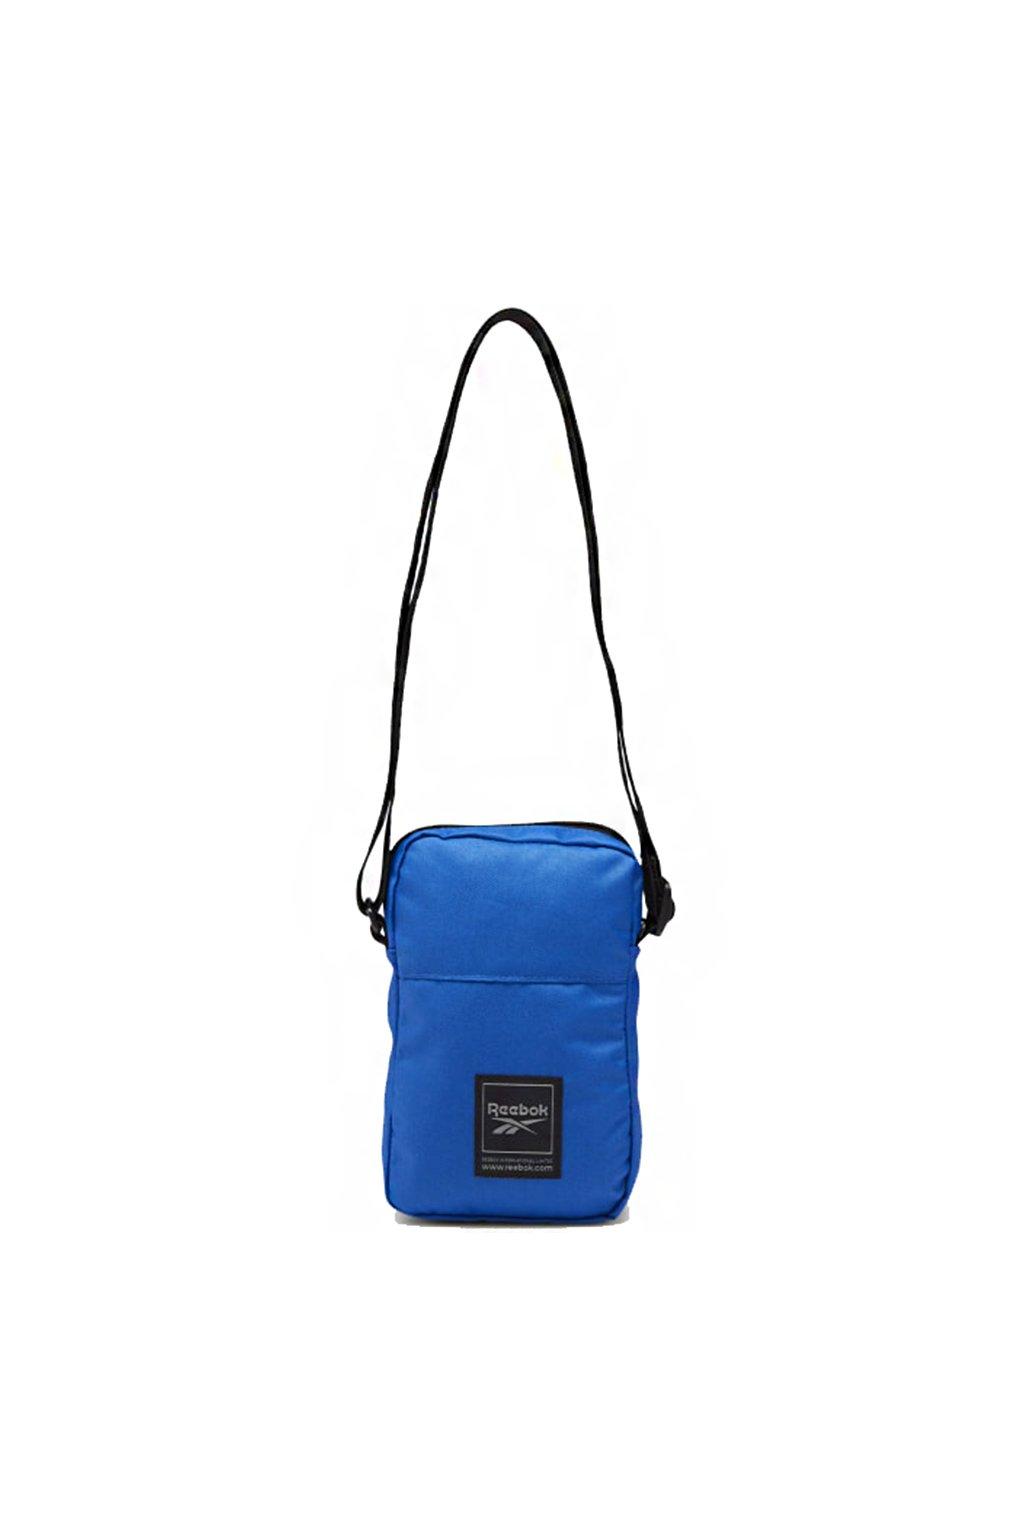 Taška na rameno Reebok Workout City Bag modrá FQ5289